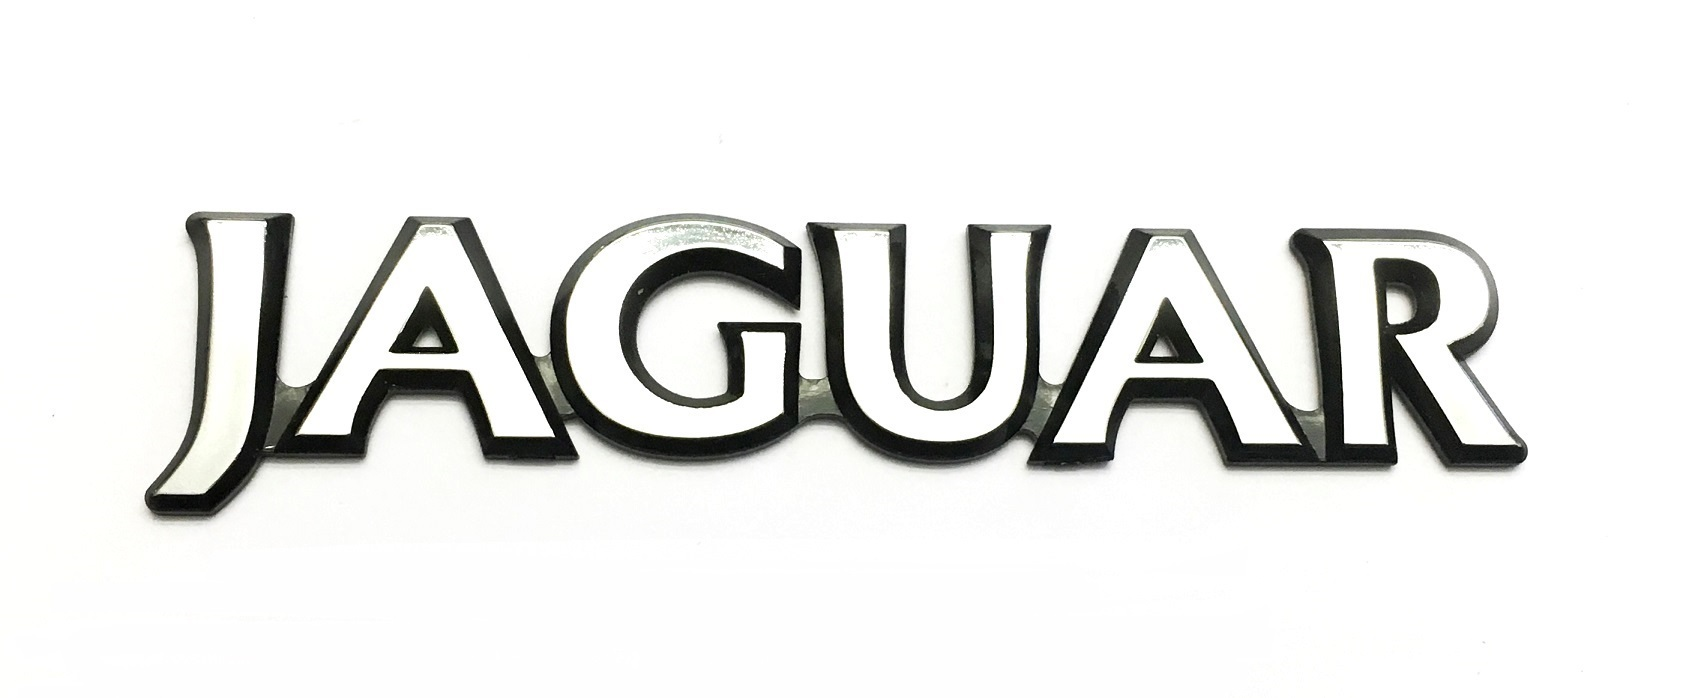 Jaguar XJS Boot Badge - JAGUAR